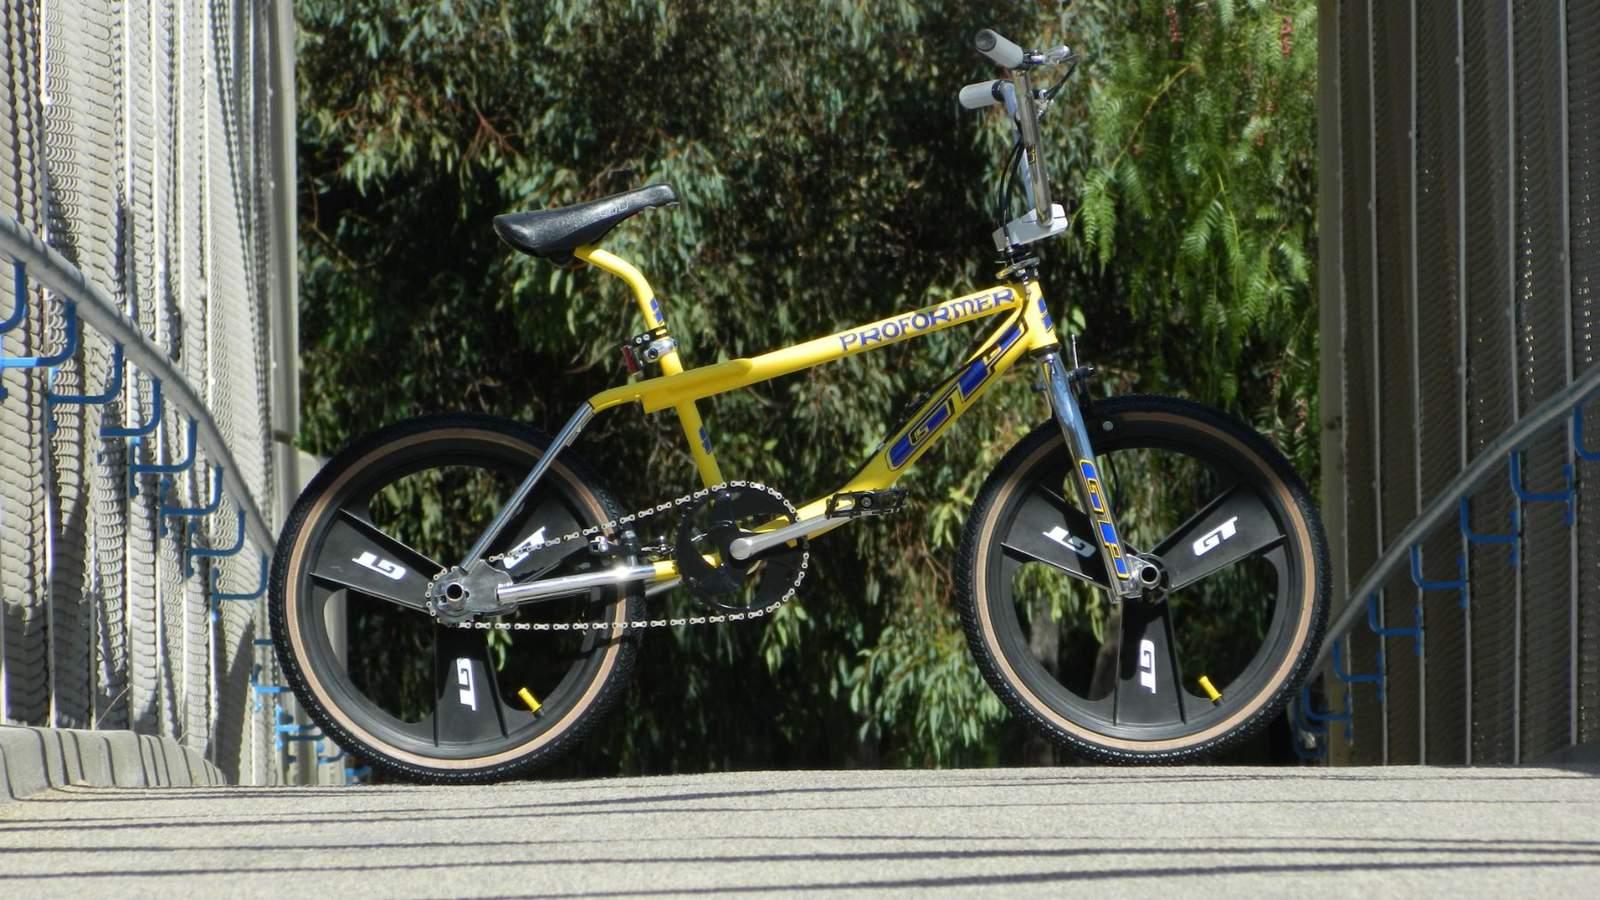 https://s3.amazonaws.com/uploads.bmxmuseum.com/user-images/17414/gp-bike-side-view5f8ce47755.jpg